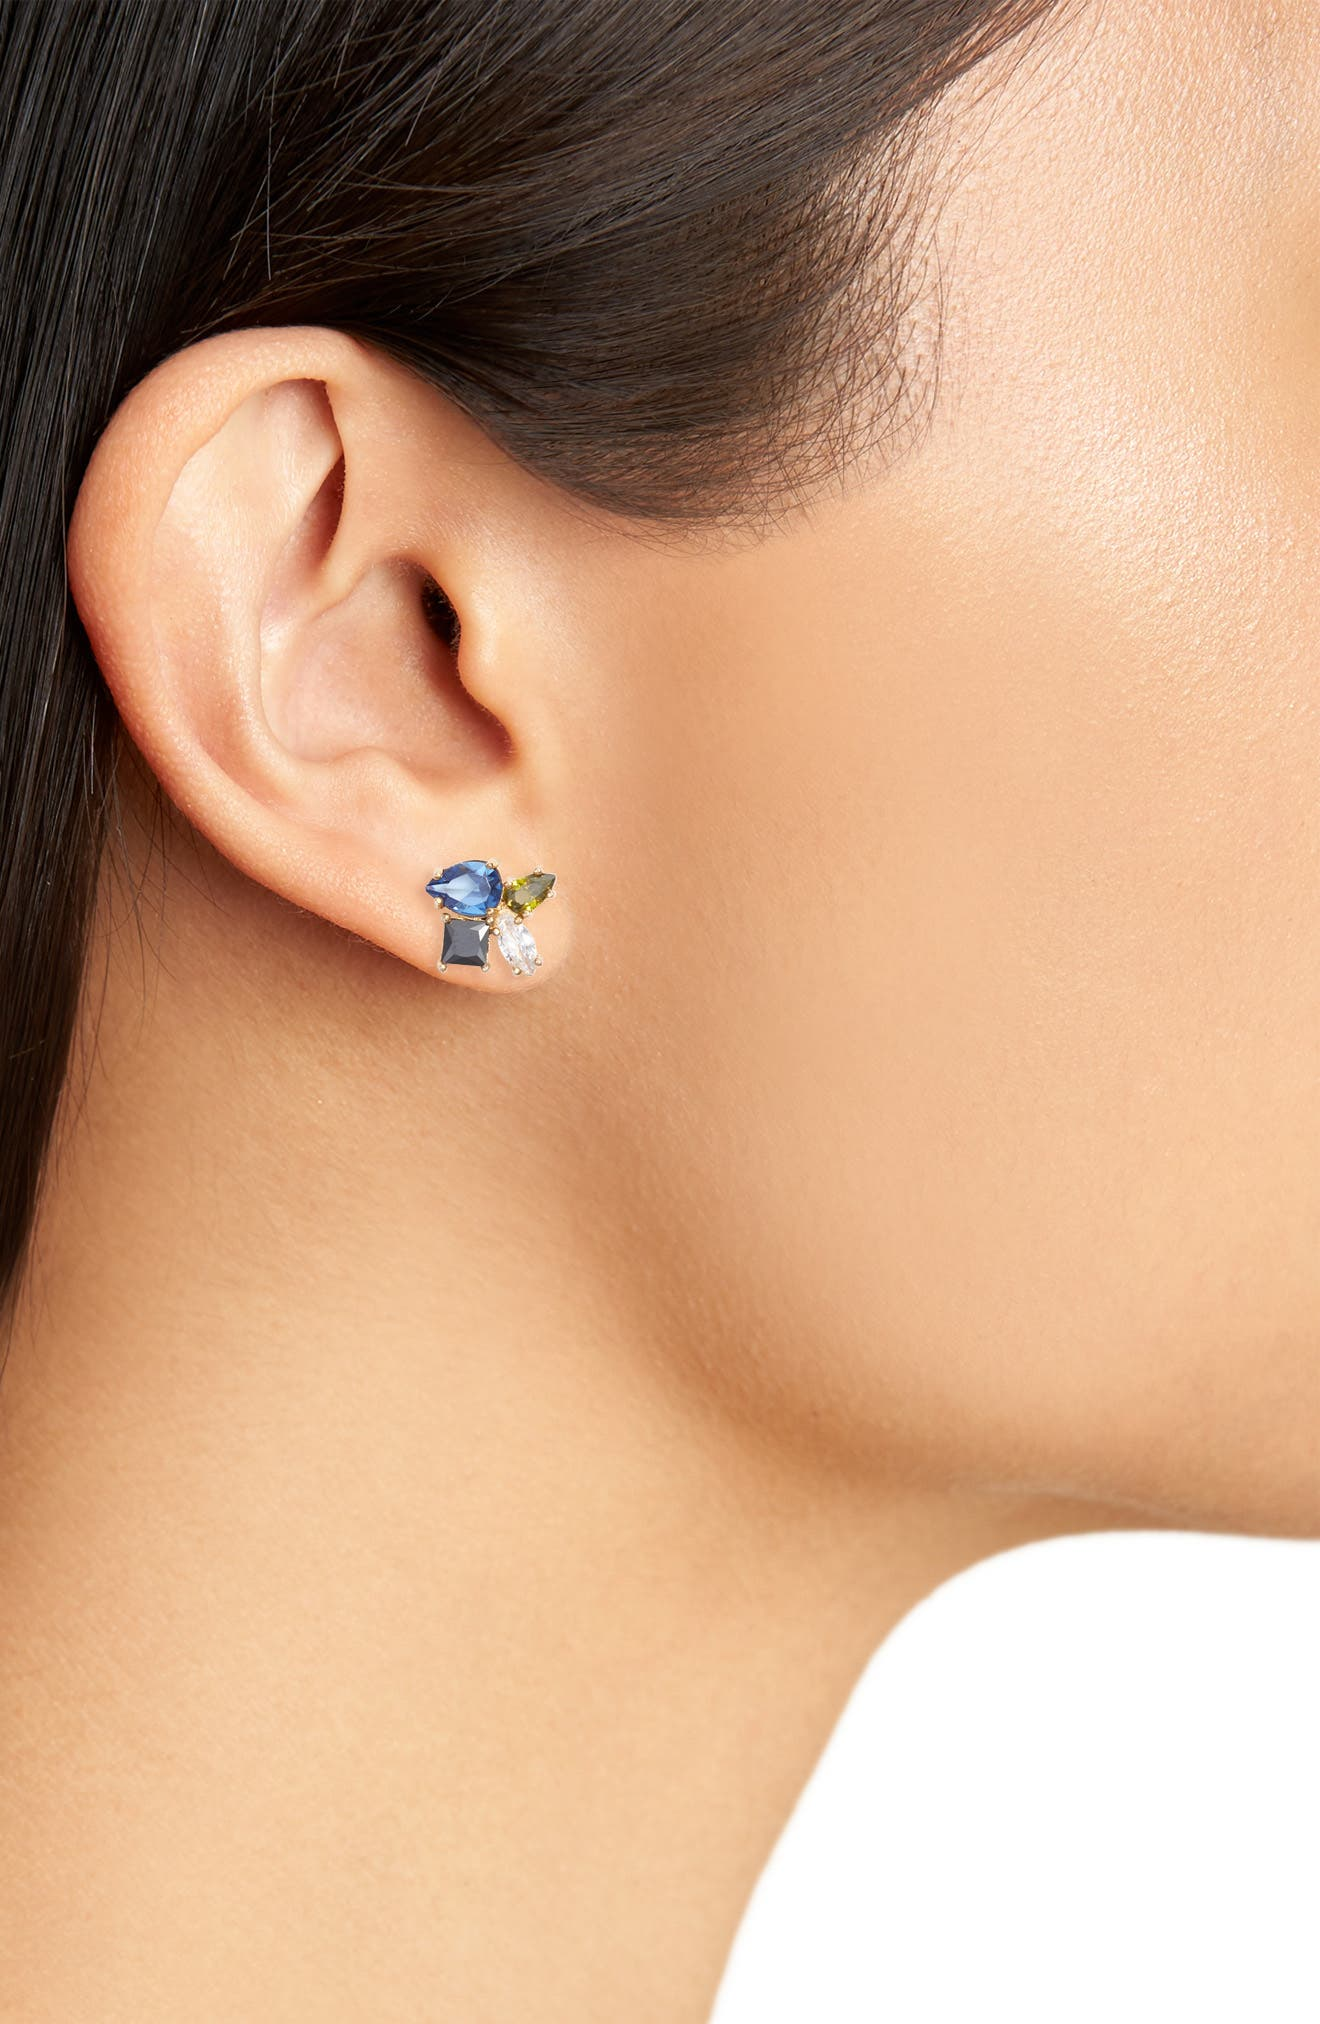 flying color cluster stud earrings,                             Alternate thumbnail 2, color,                             BLUE MULTI